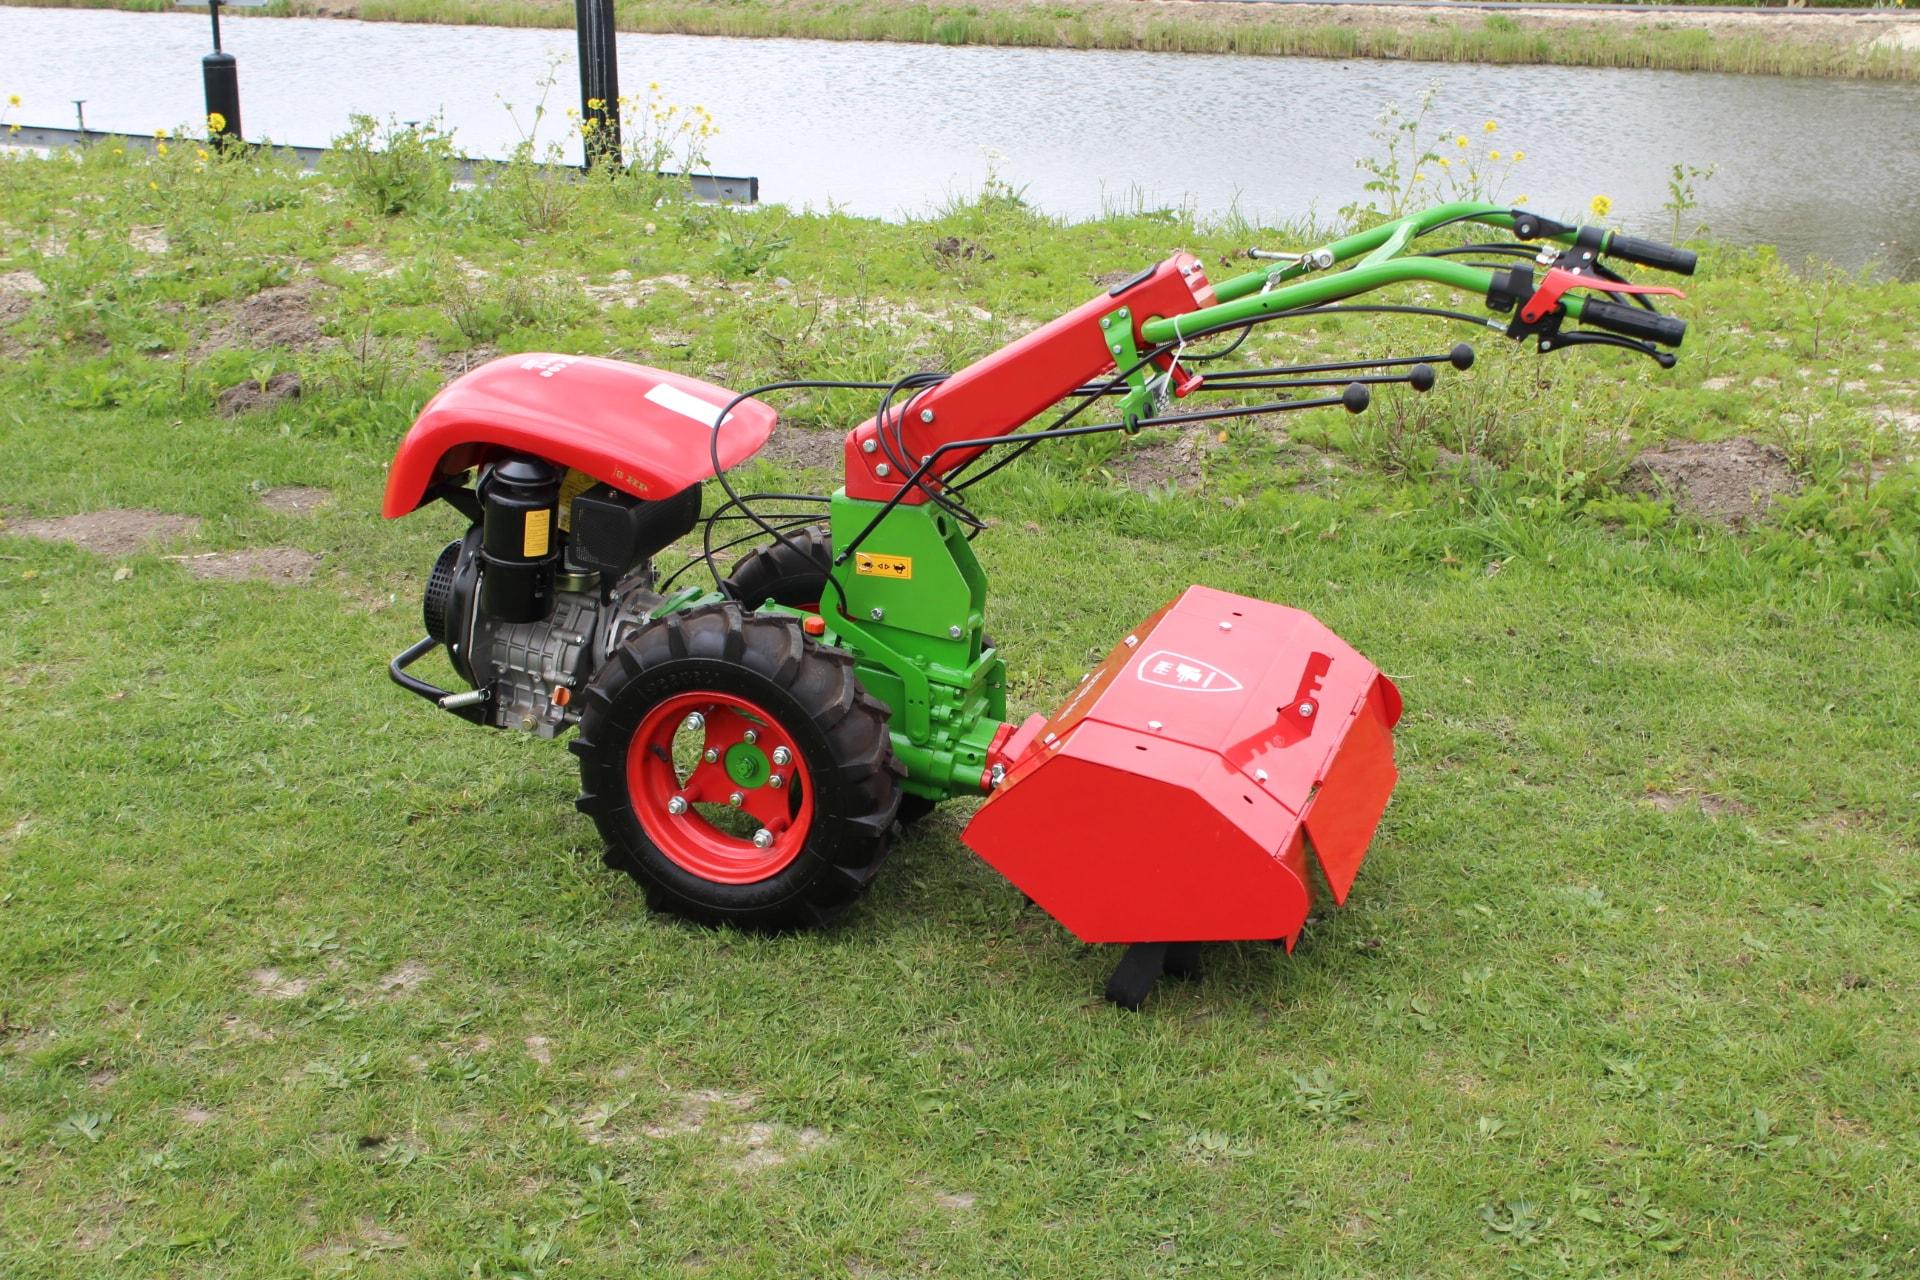 FPM Tweewiel Tractor 408 KM178F Kipor 5.00